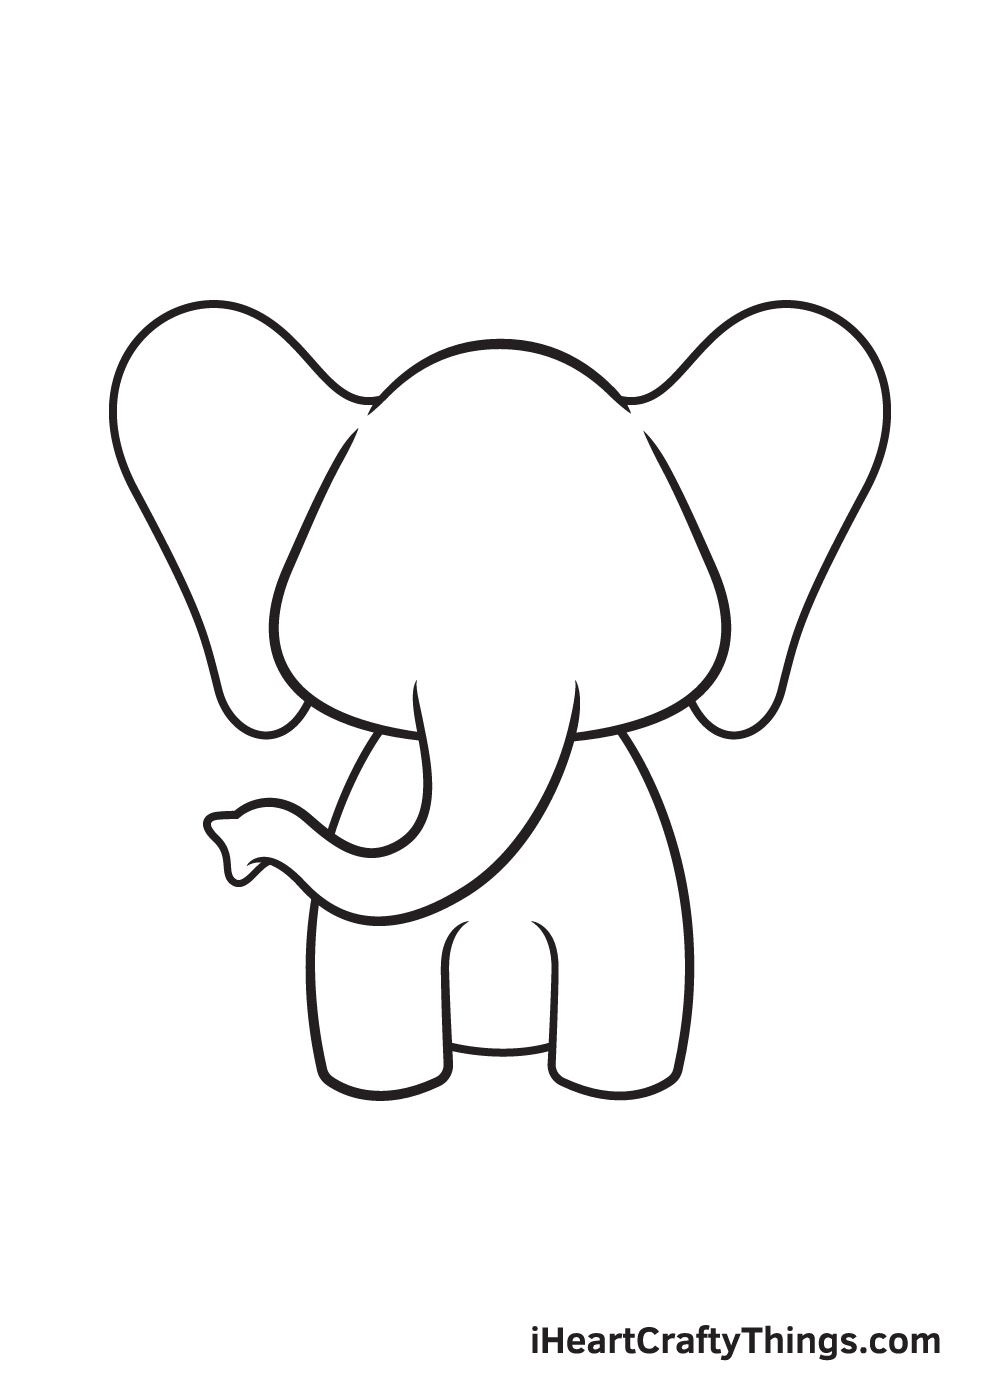 Elephant Drawing – Step 5